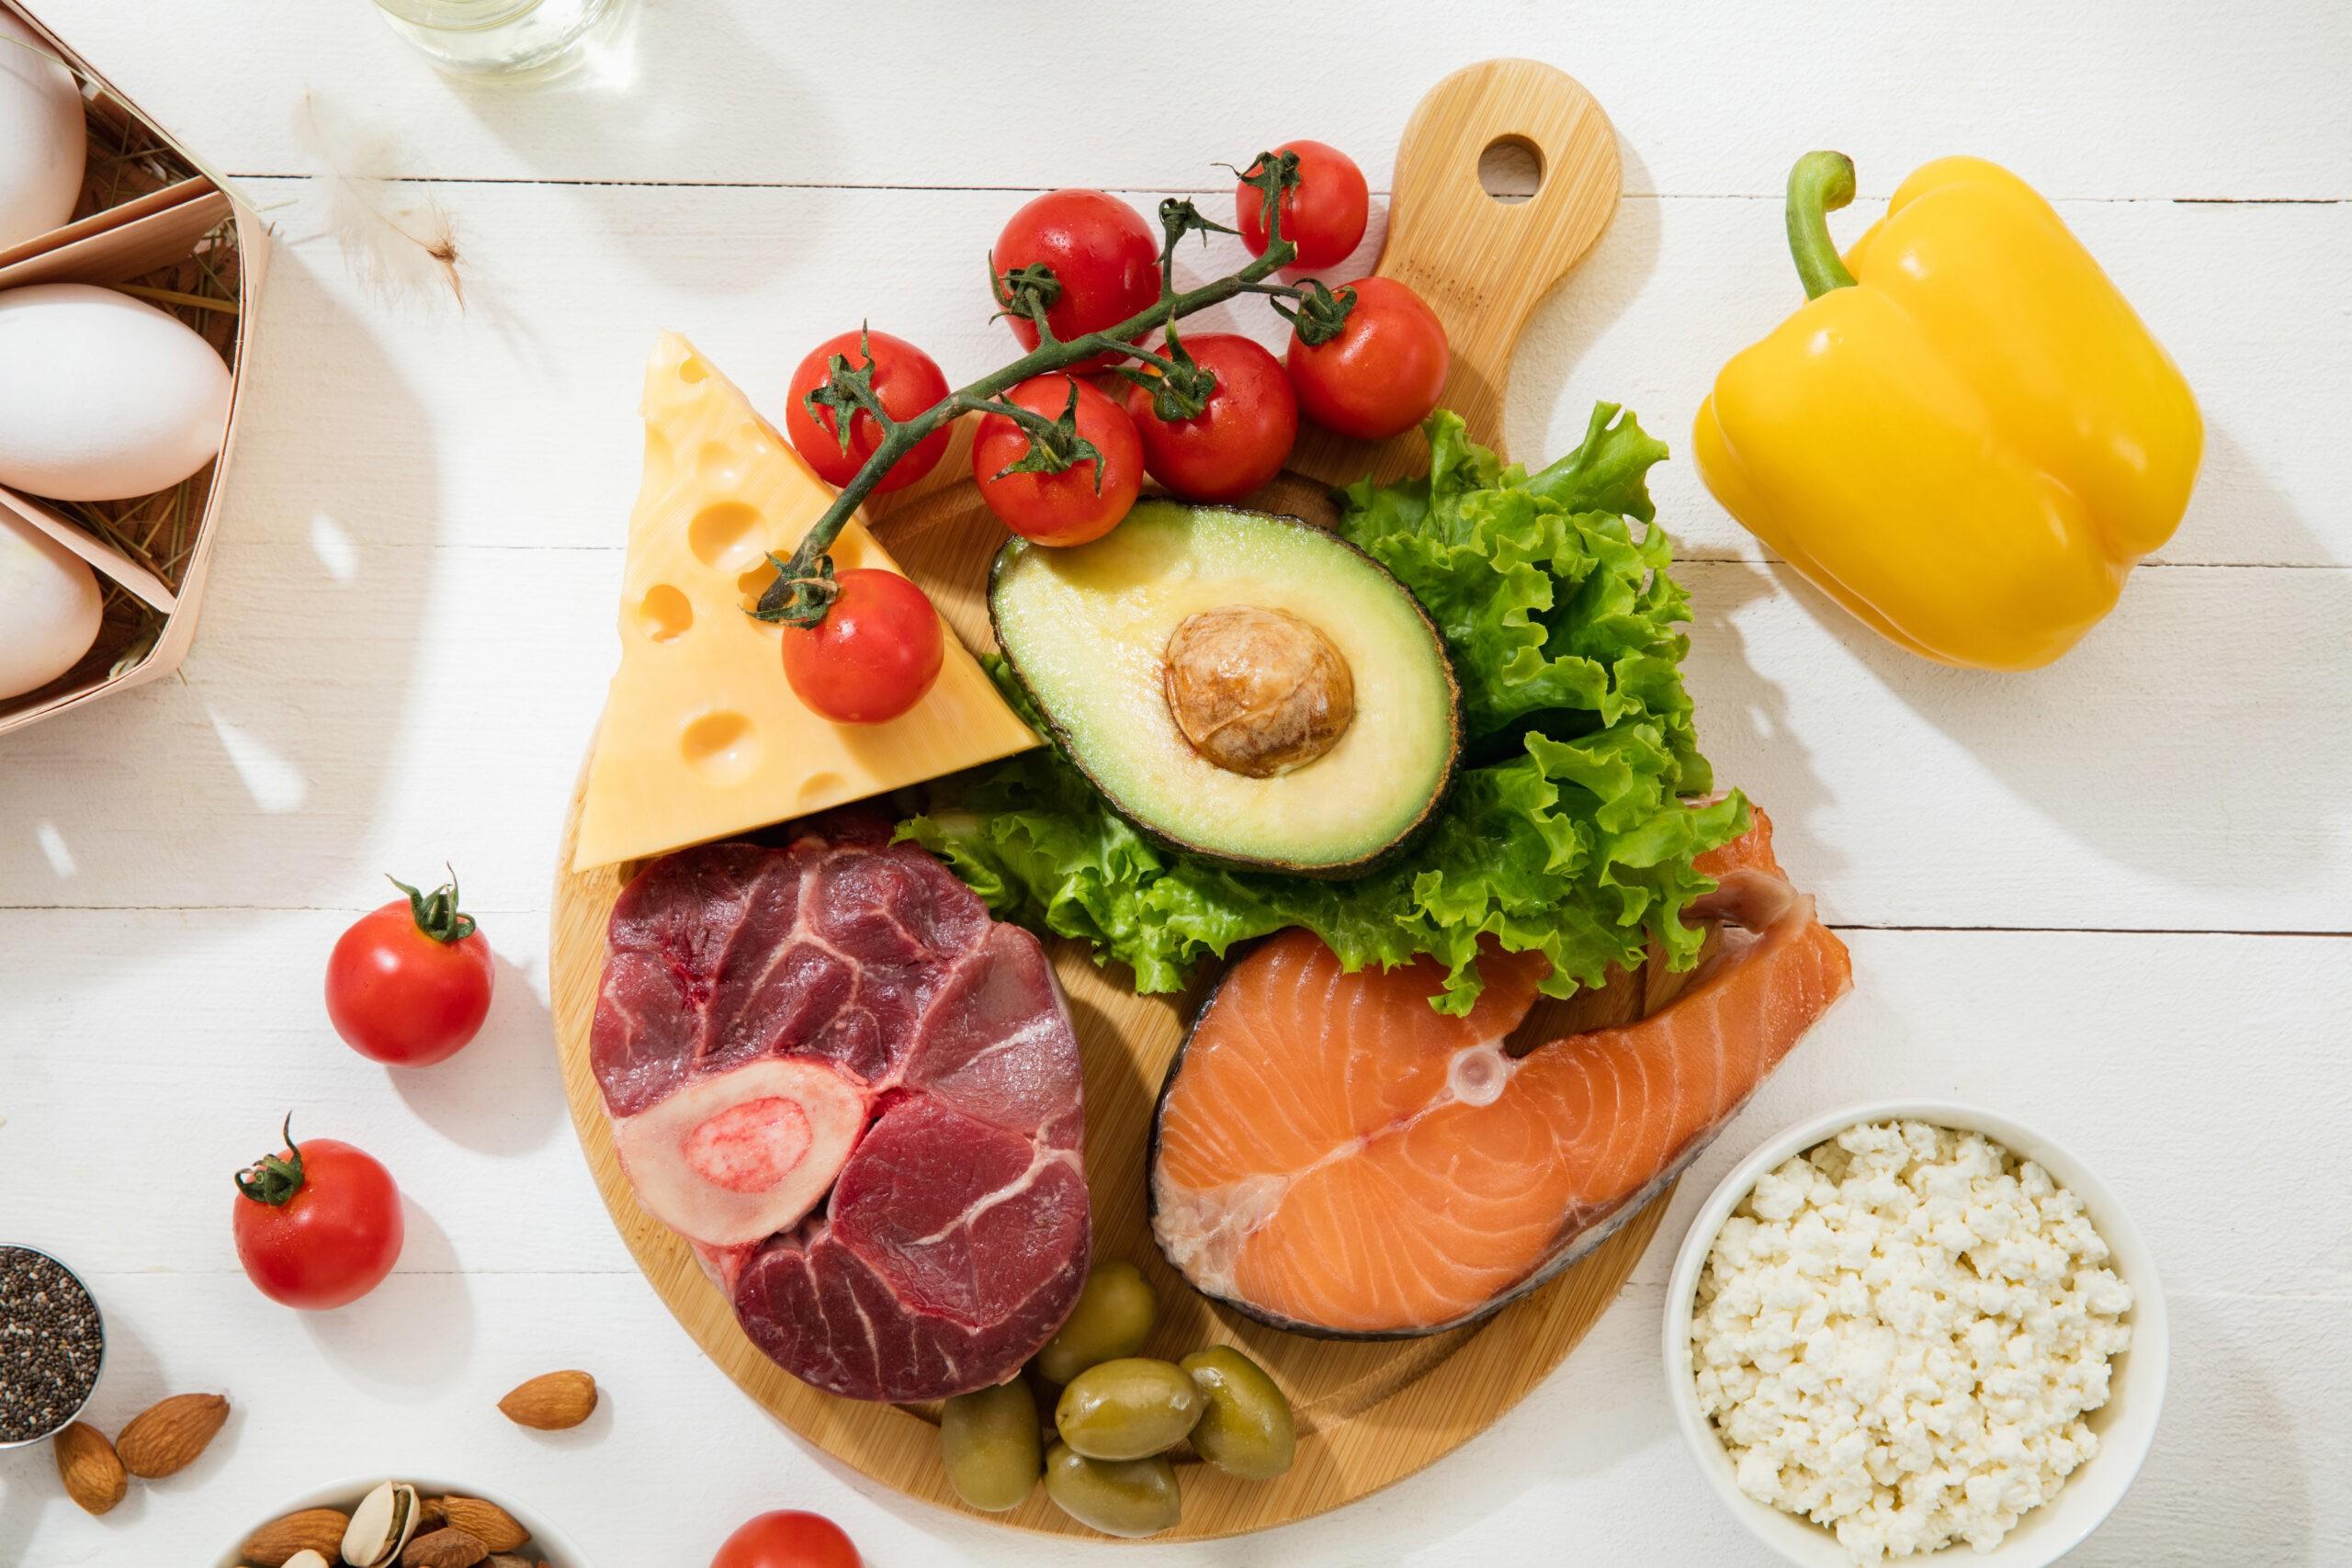 Dieta da proteína emagrecer 20 kg